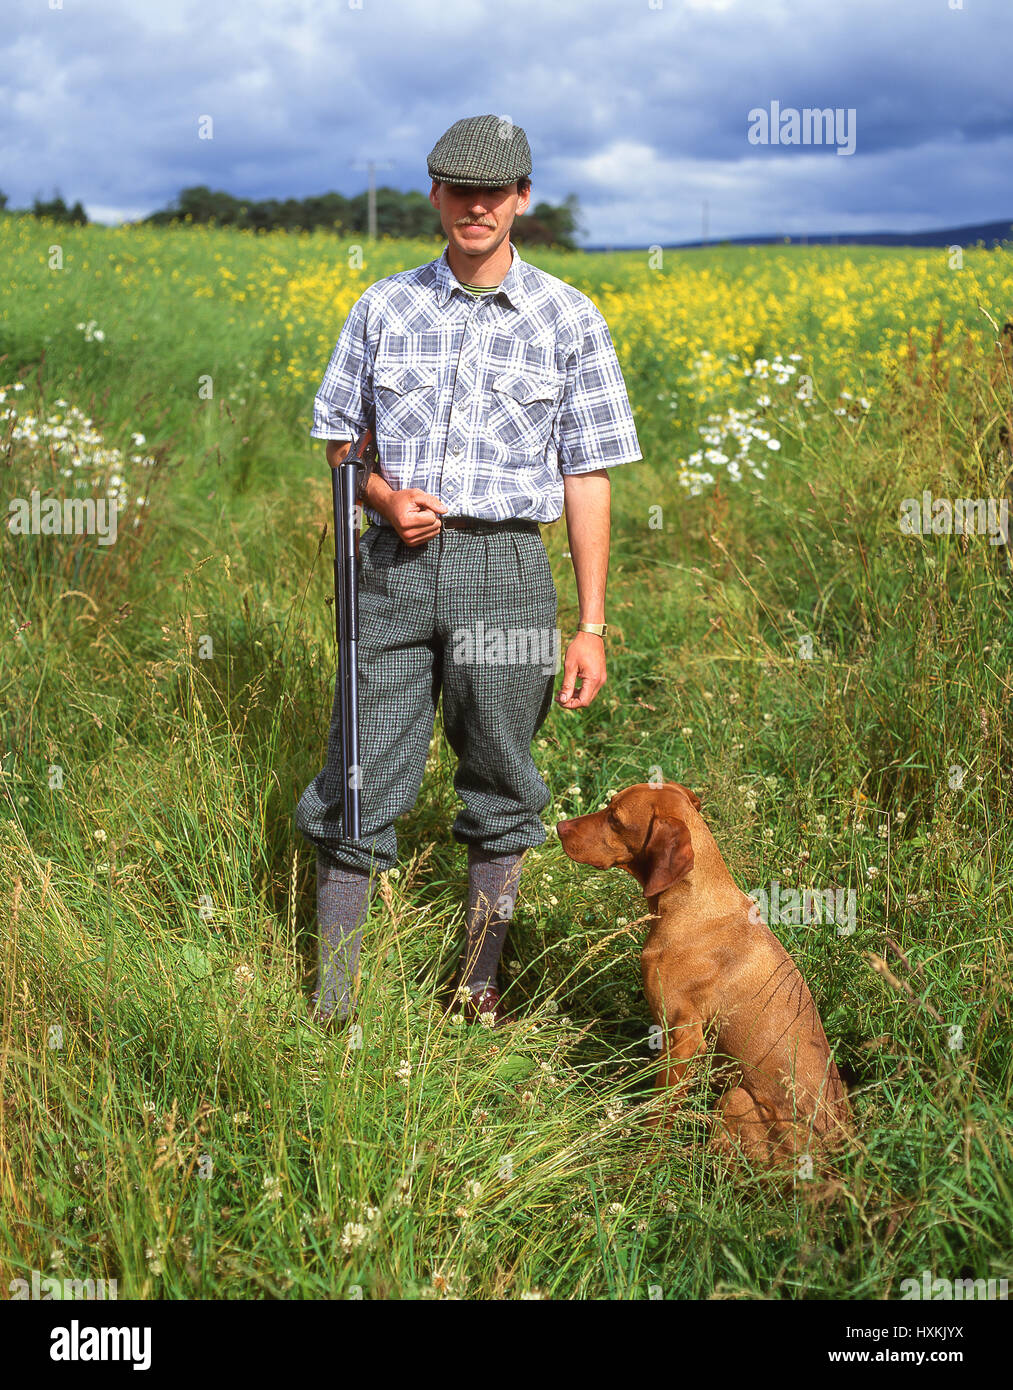 Man in countryside hunting with Magyar Vizsla dog, Fife, Scotland, United Kingdom - Stock Image